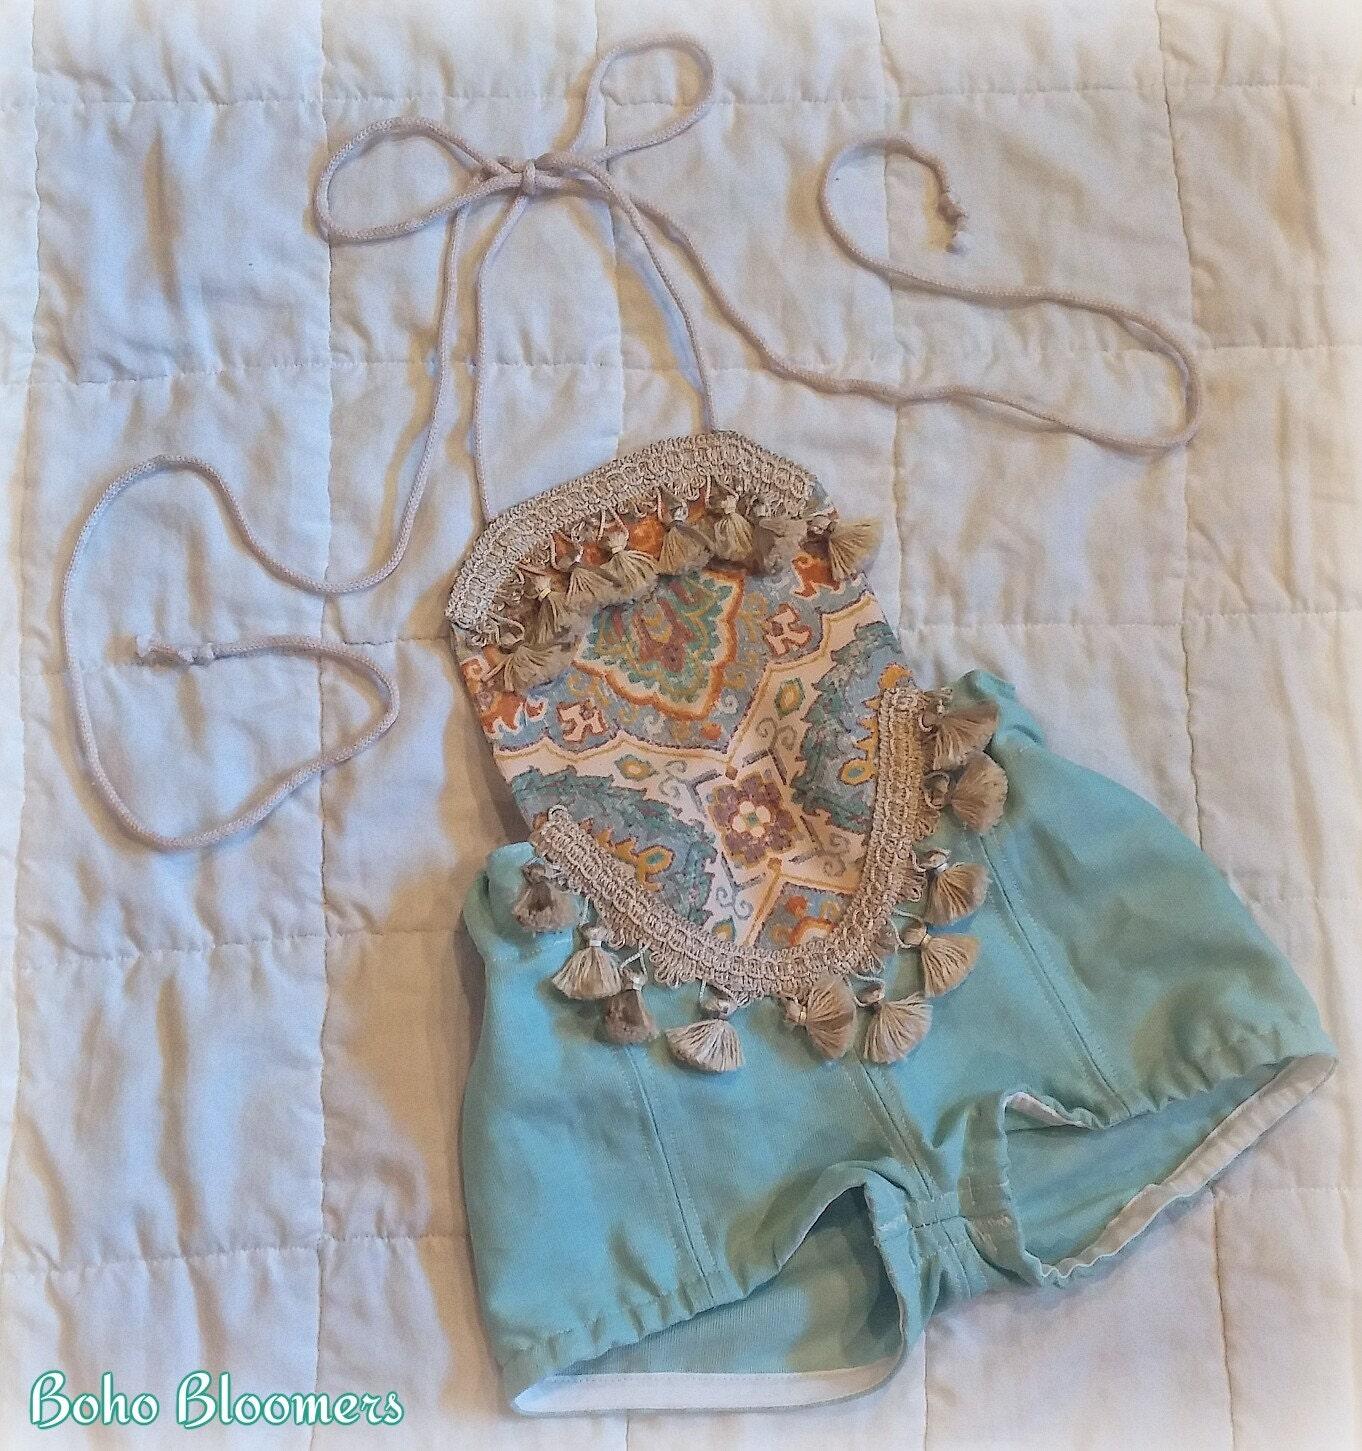 Baby Romper Baby Girl Clothing Teal Romper Playsuit Birthday